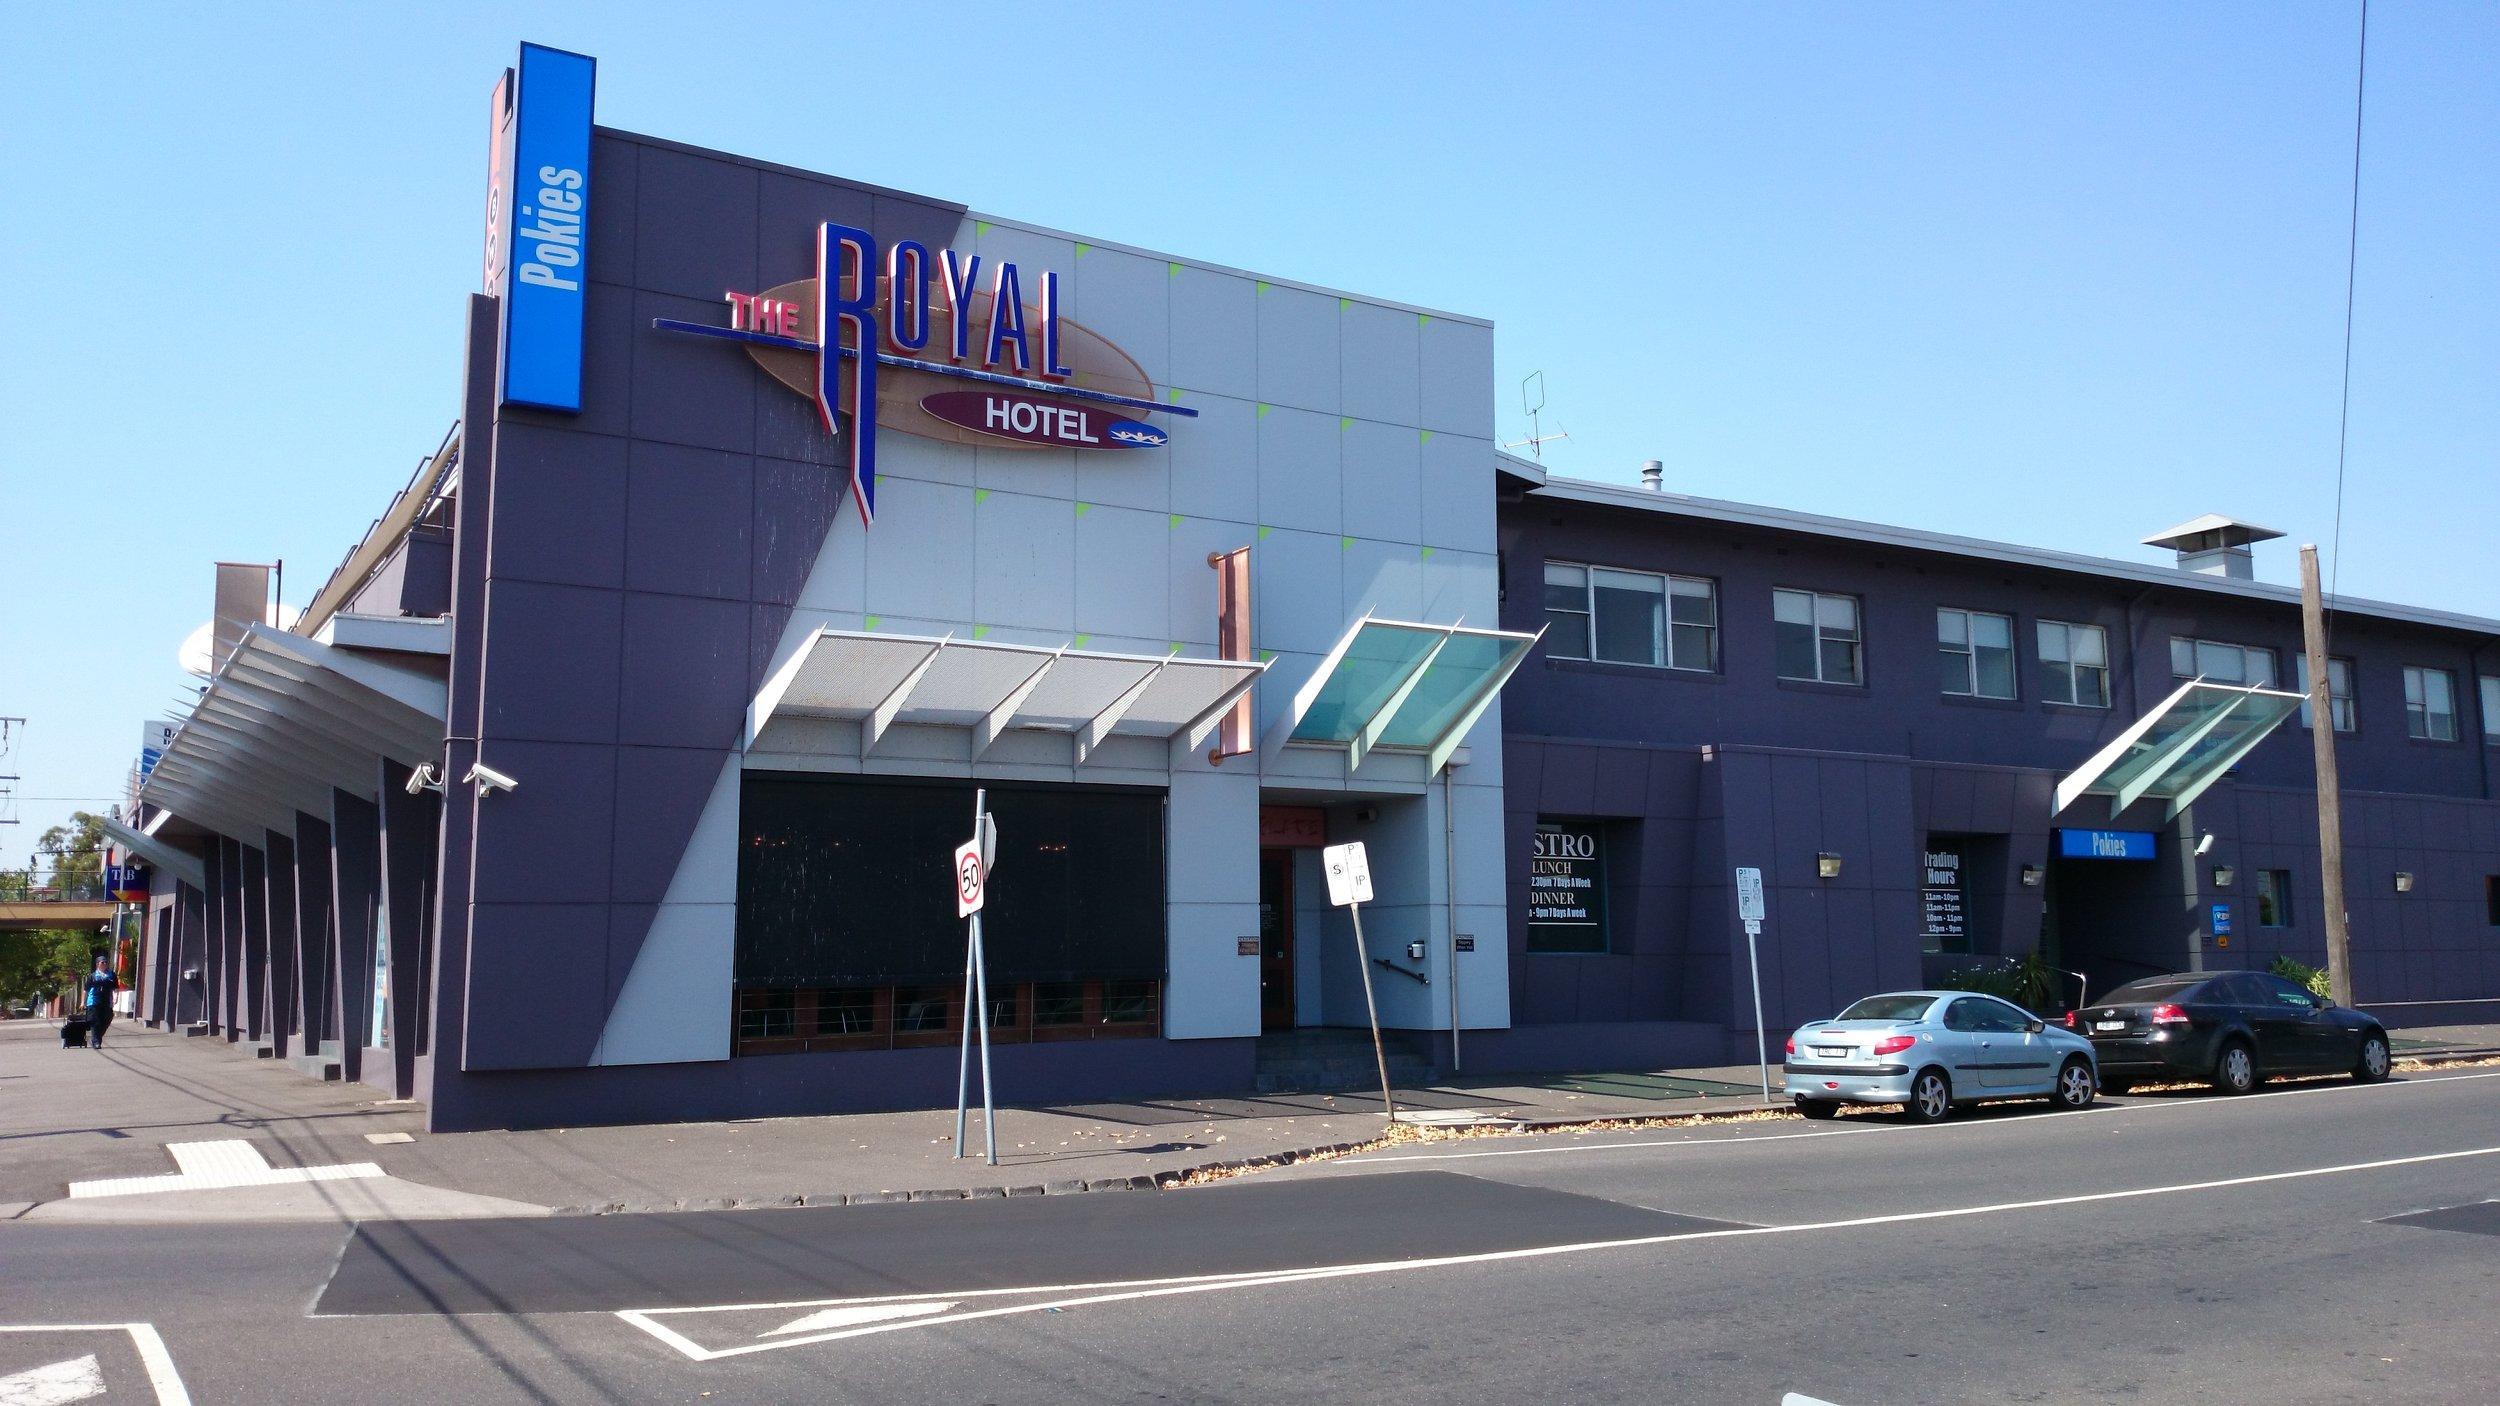 The_Royal_Hotel_in_Essendon.jpg